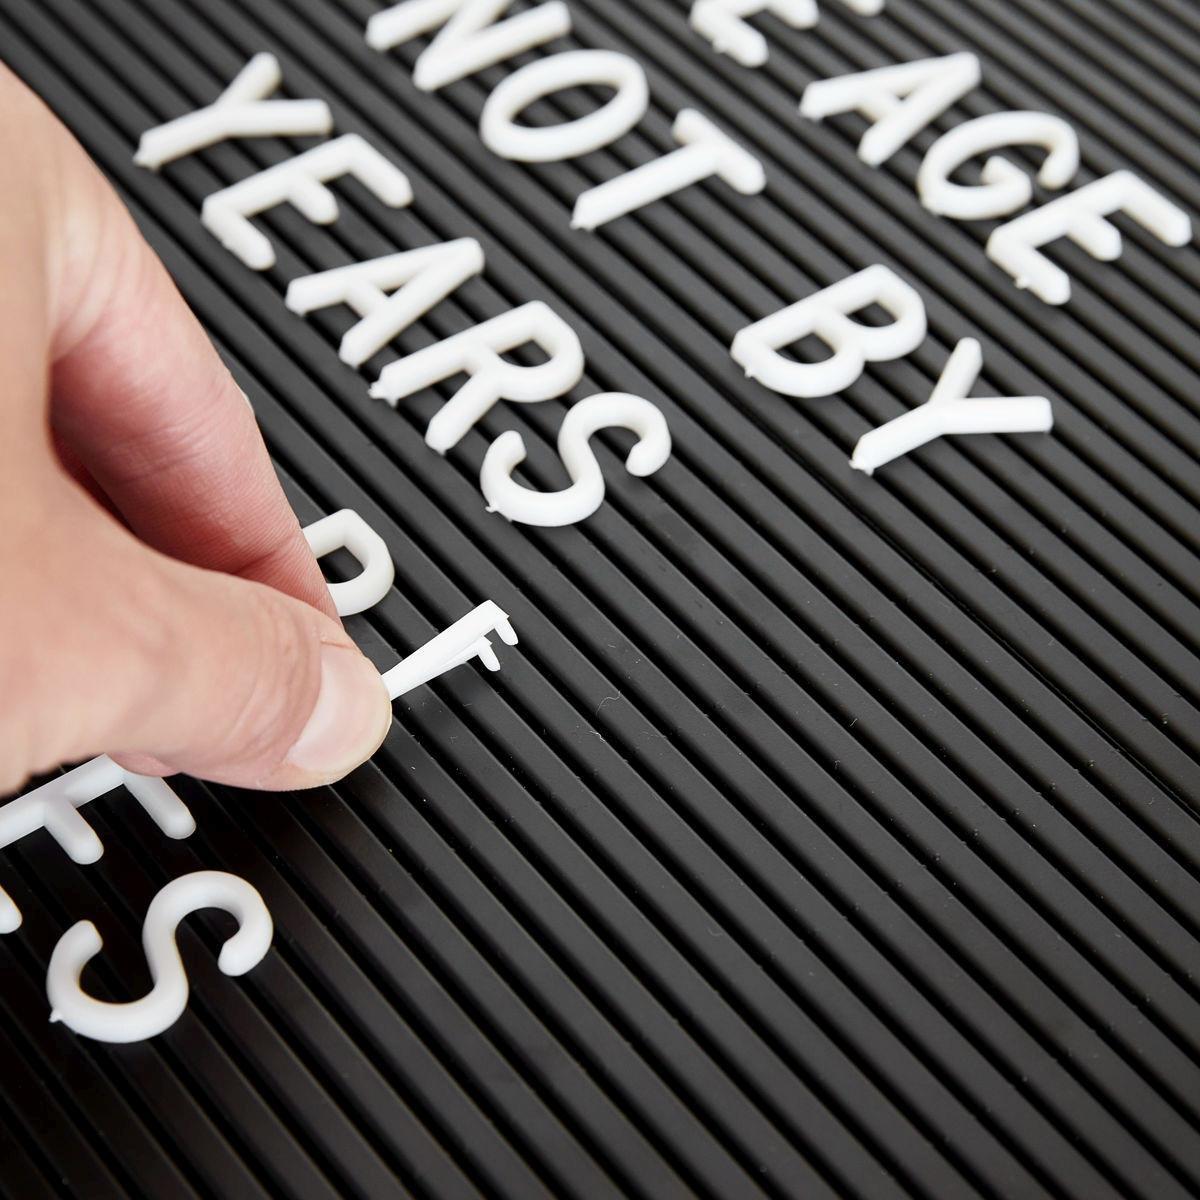 MONOGRAPH Sada písmen, číslic a symbolů k tabuli na vzkazy - 286 ks, bílá barva, plast